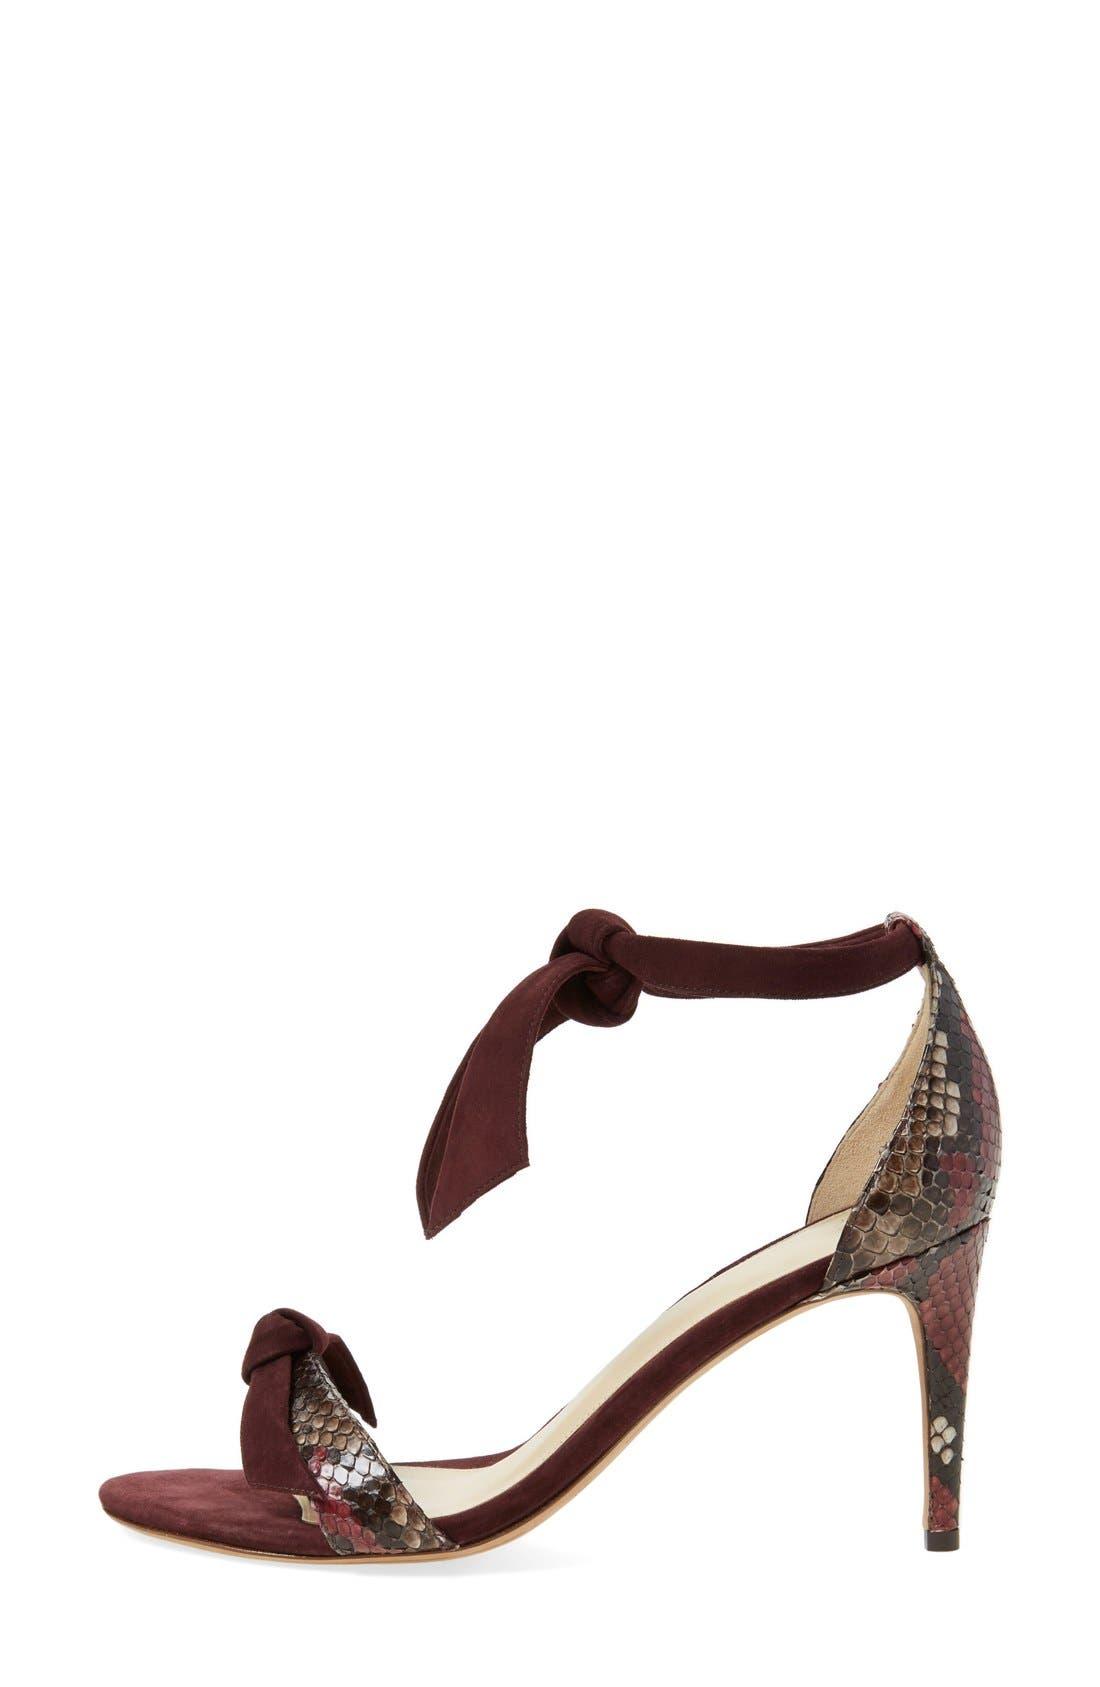 'Clarita' Suede & Genuine Python Ankle Tie Sandal,                             Alternate thumbnail 4, color,                             930